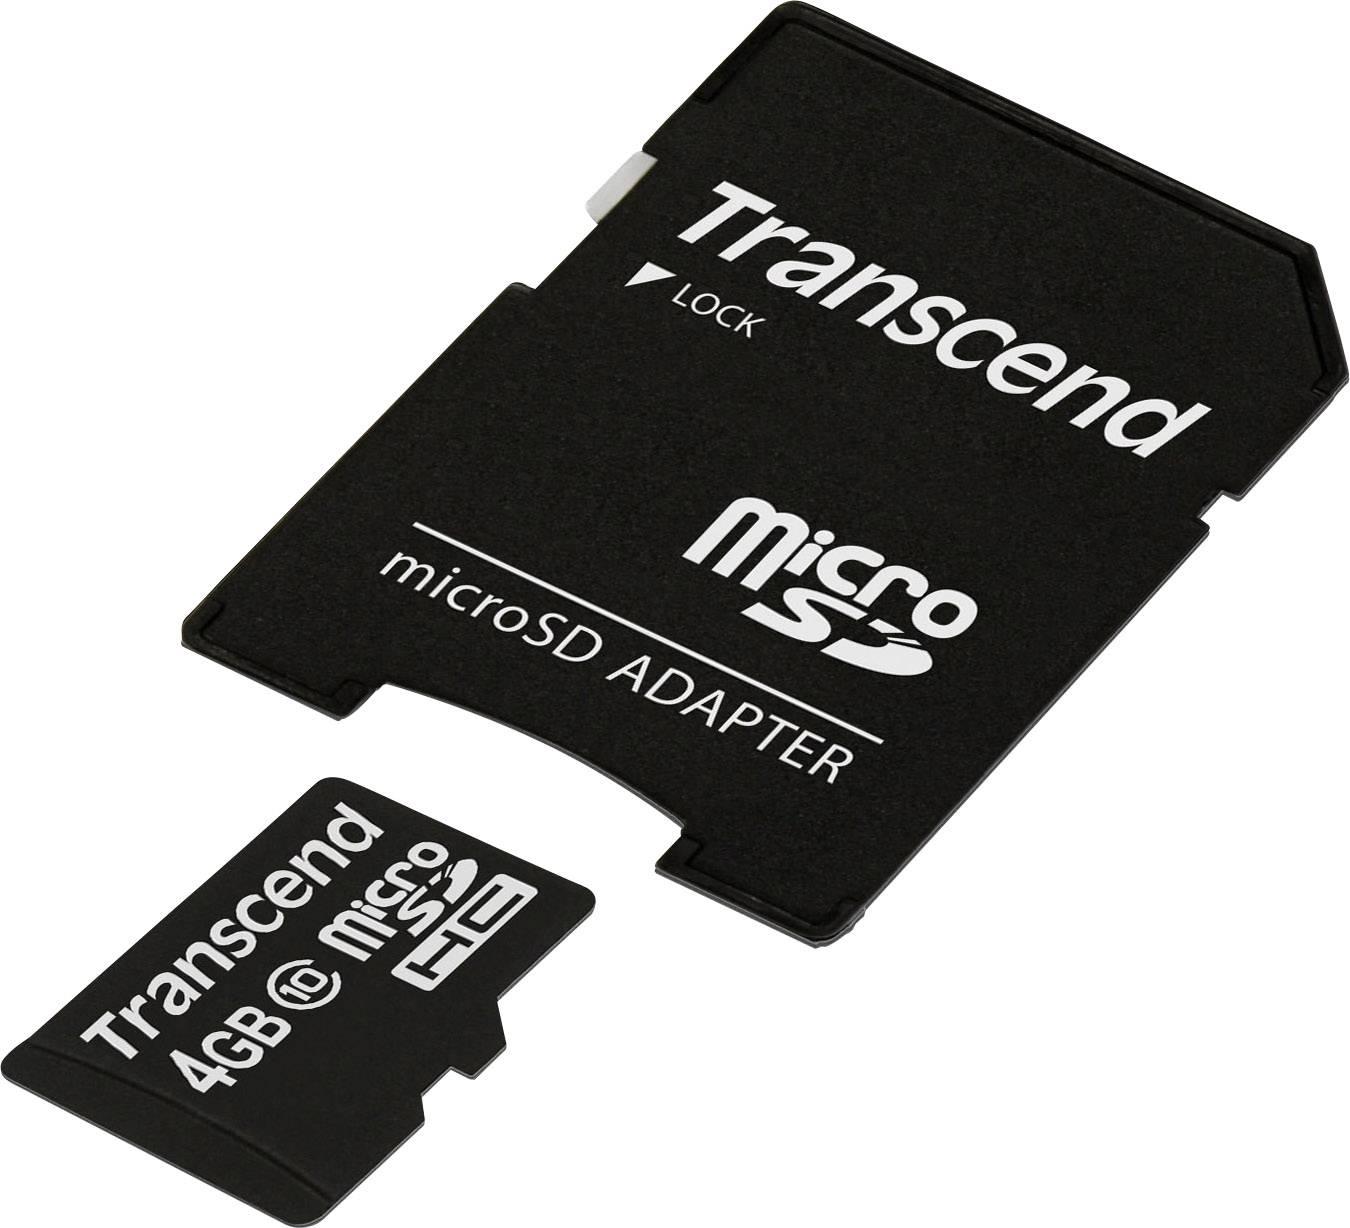 Micro Sd Karte 4gb.Transcend Premium Microsdhc Karte 4 Gb Class 10 Inkl Sd Adapter